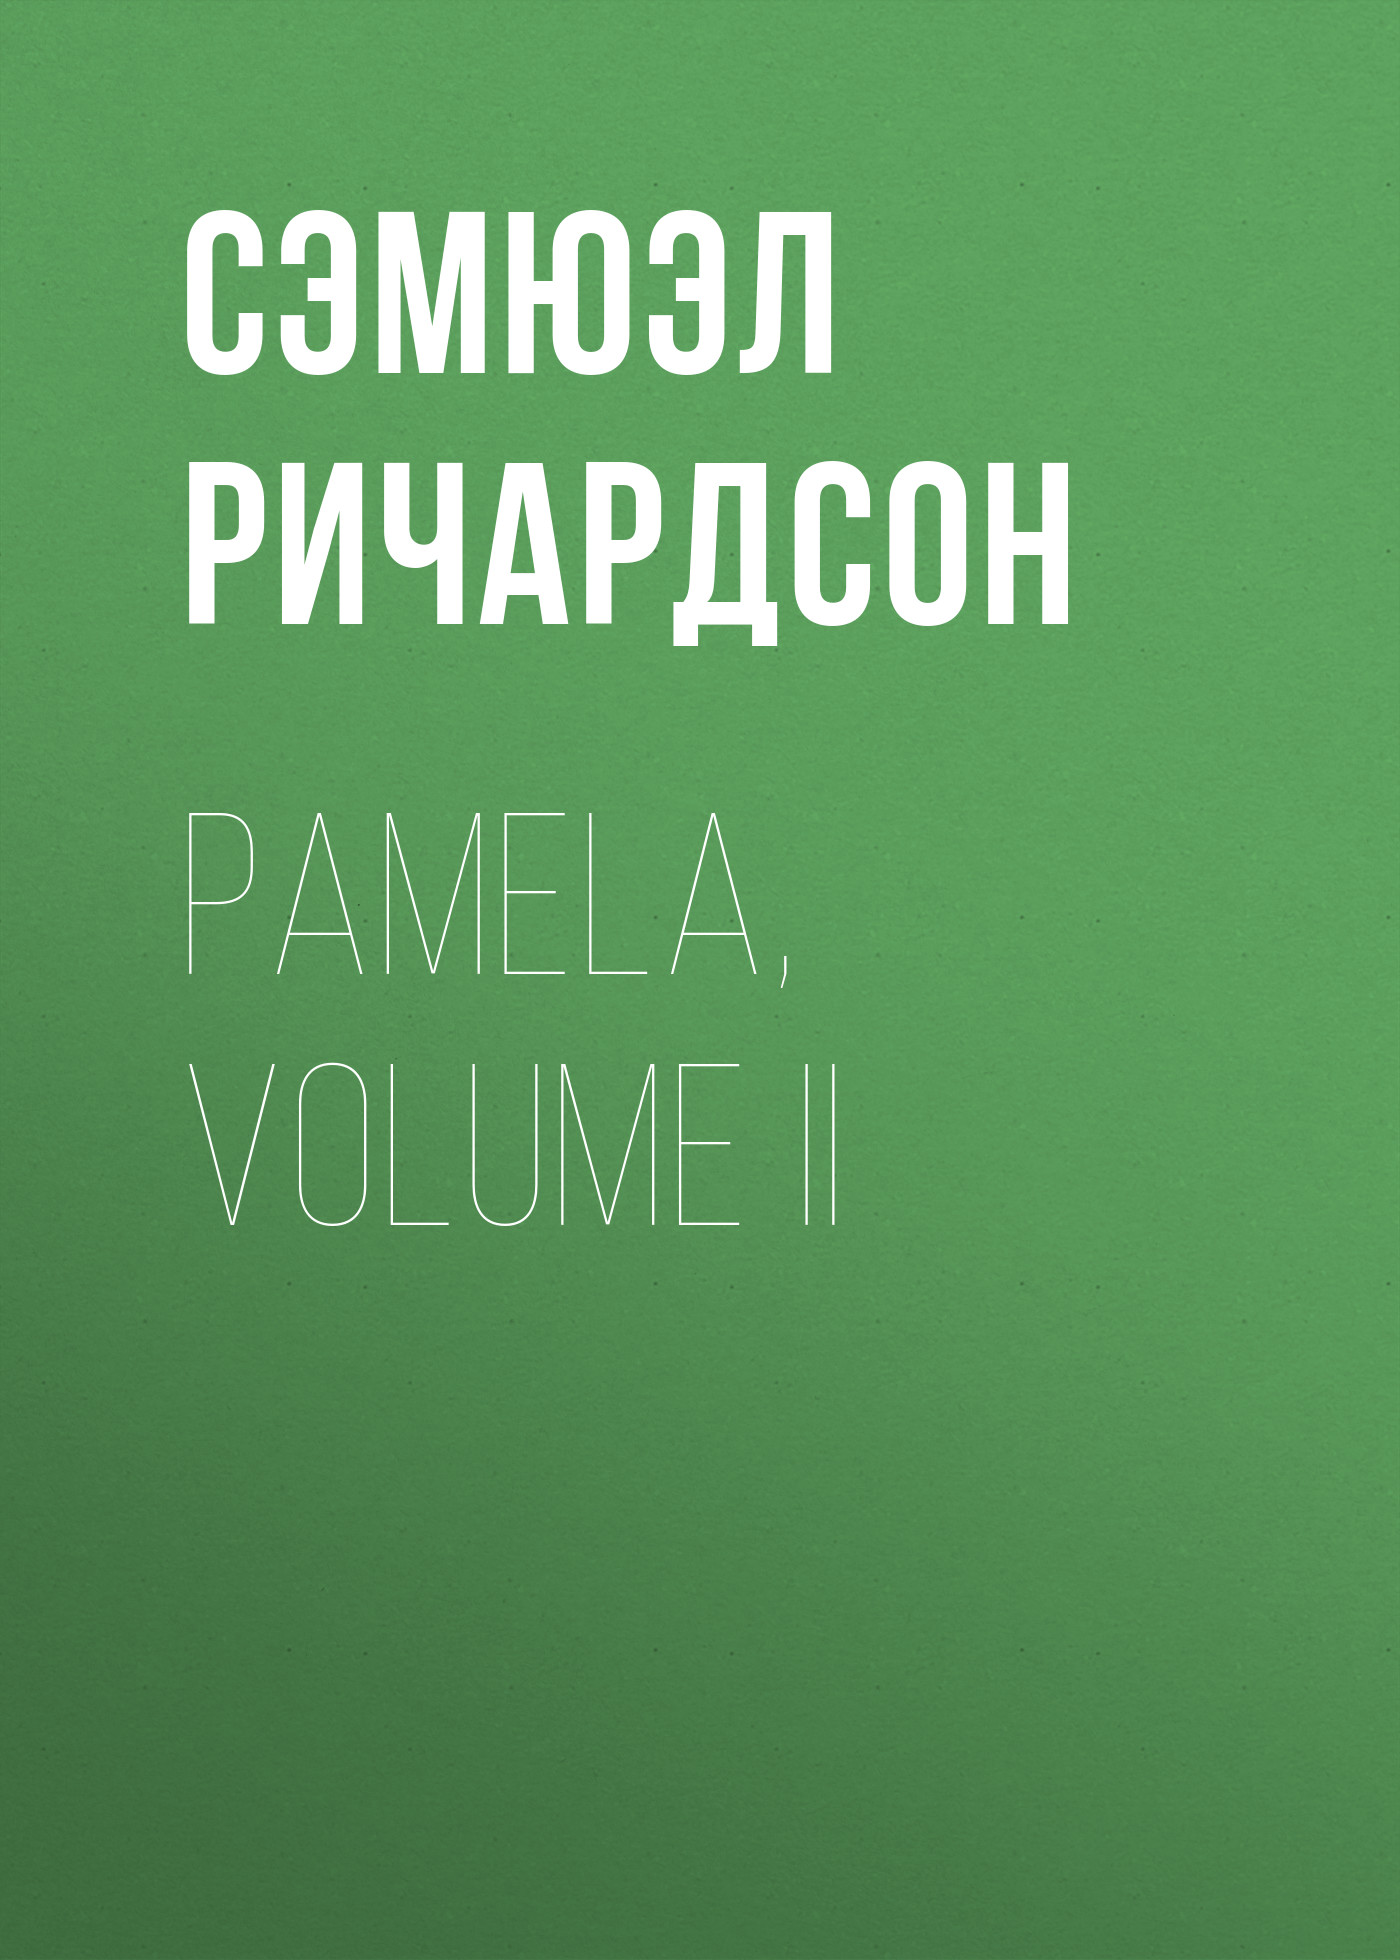 цена на Сэмюэл Ричардсон Pamela, Volume II